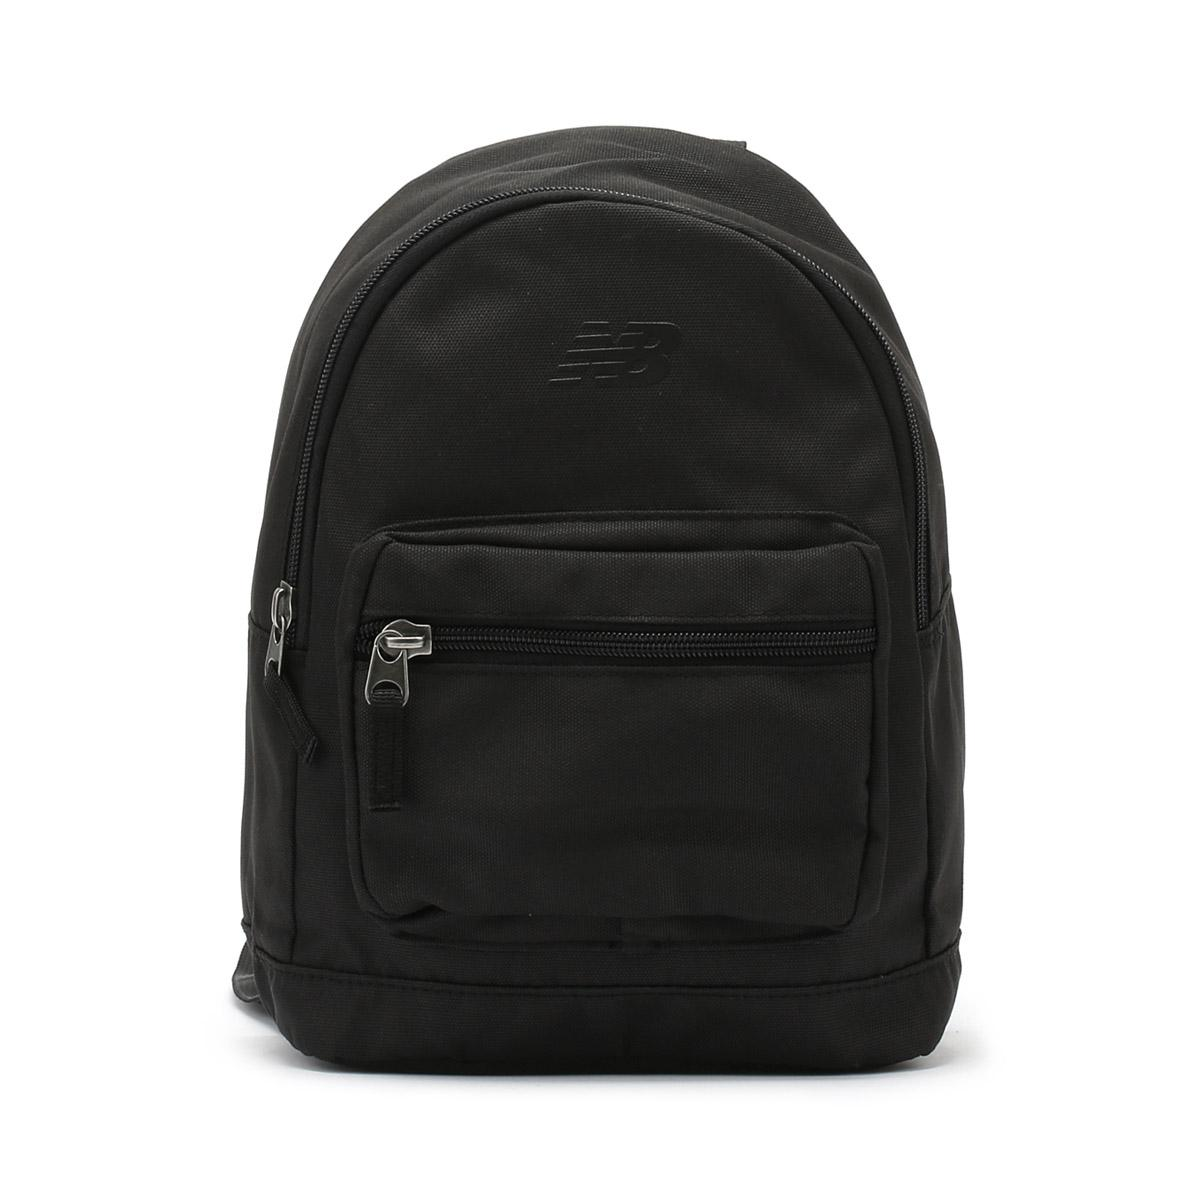 28c08c2b01a New Balance Black Mini Classic Backpack in Black for Men - Lyst